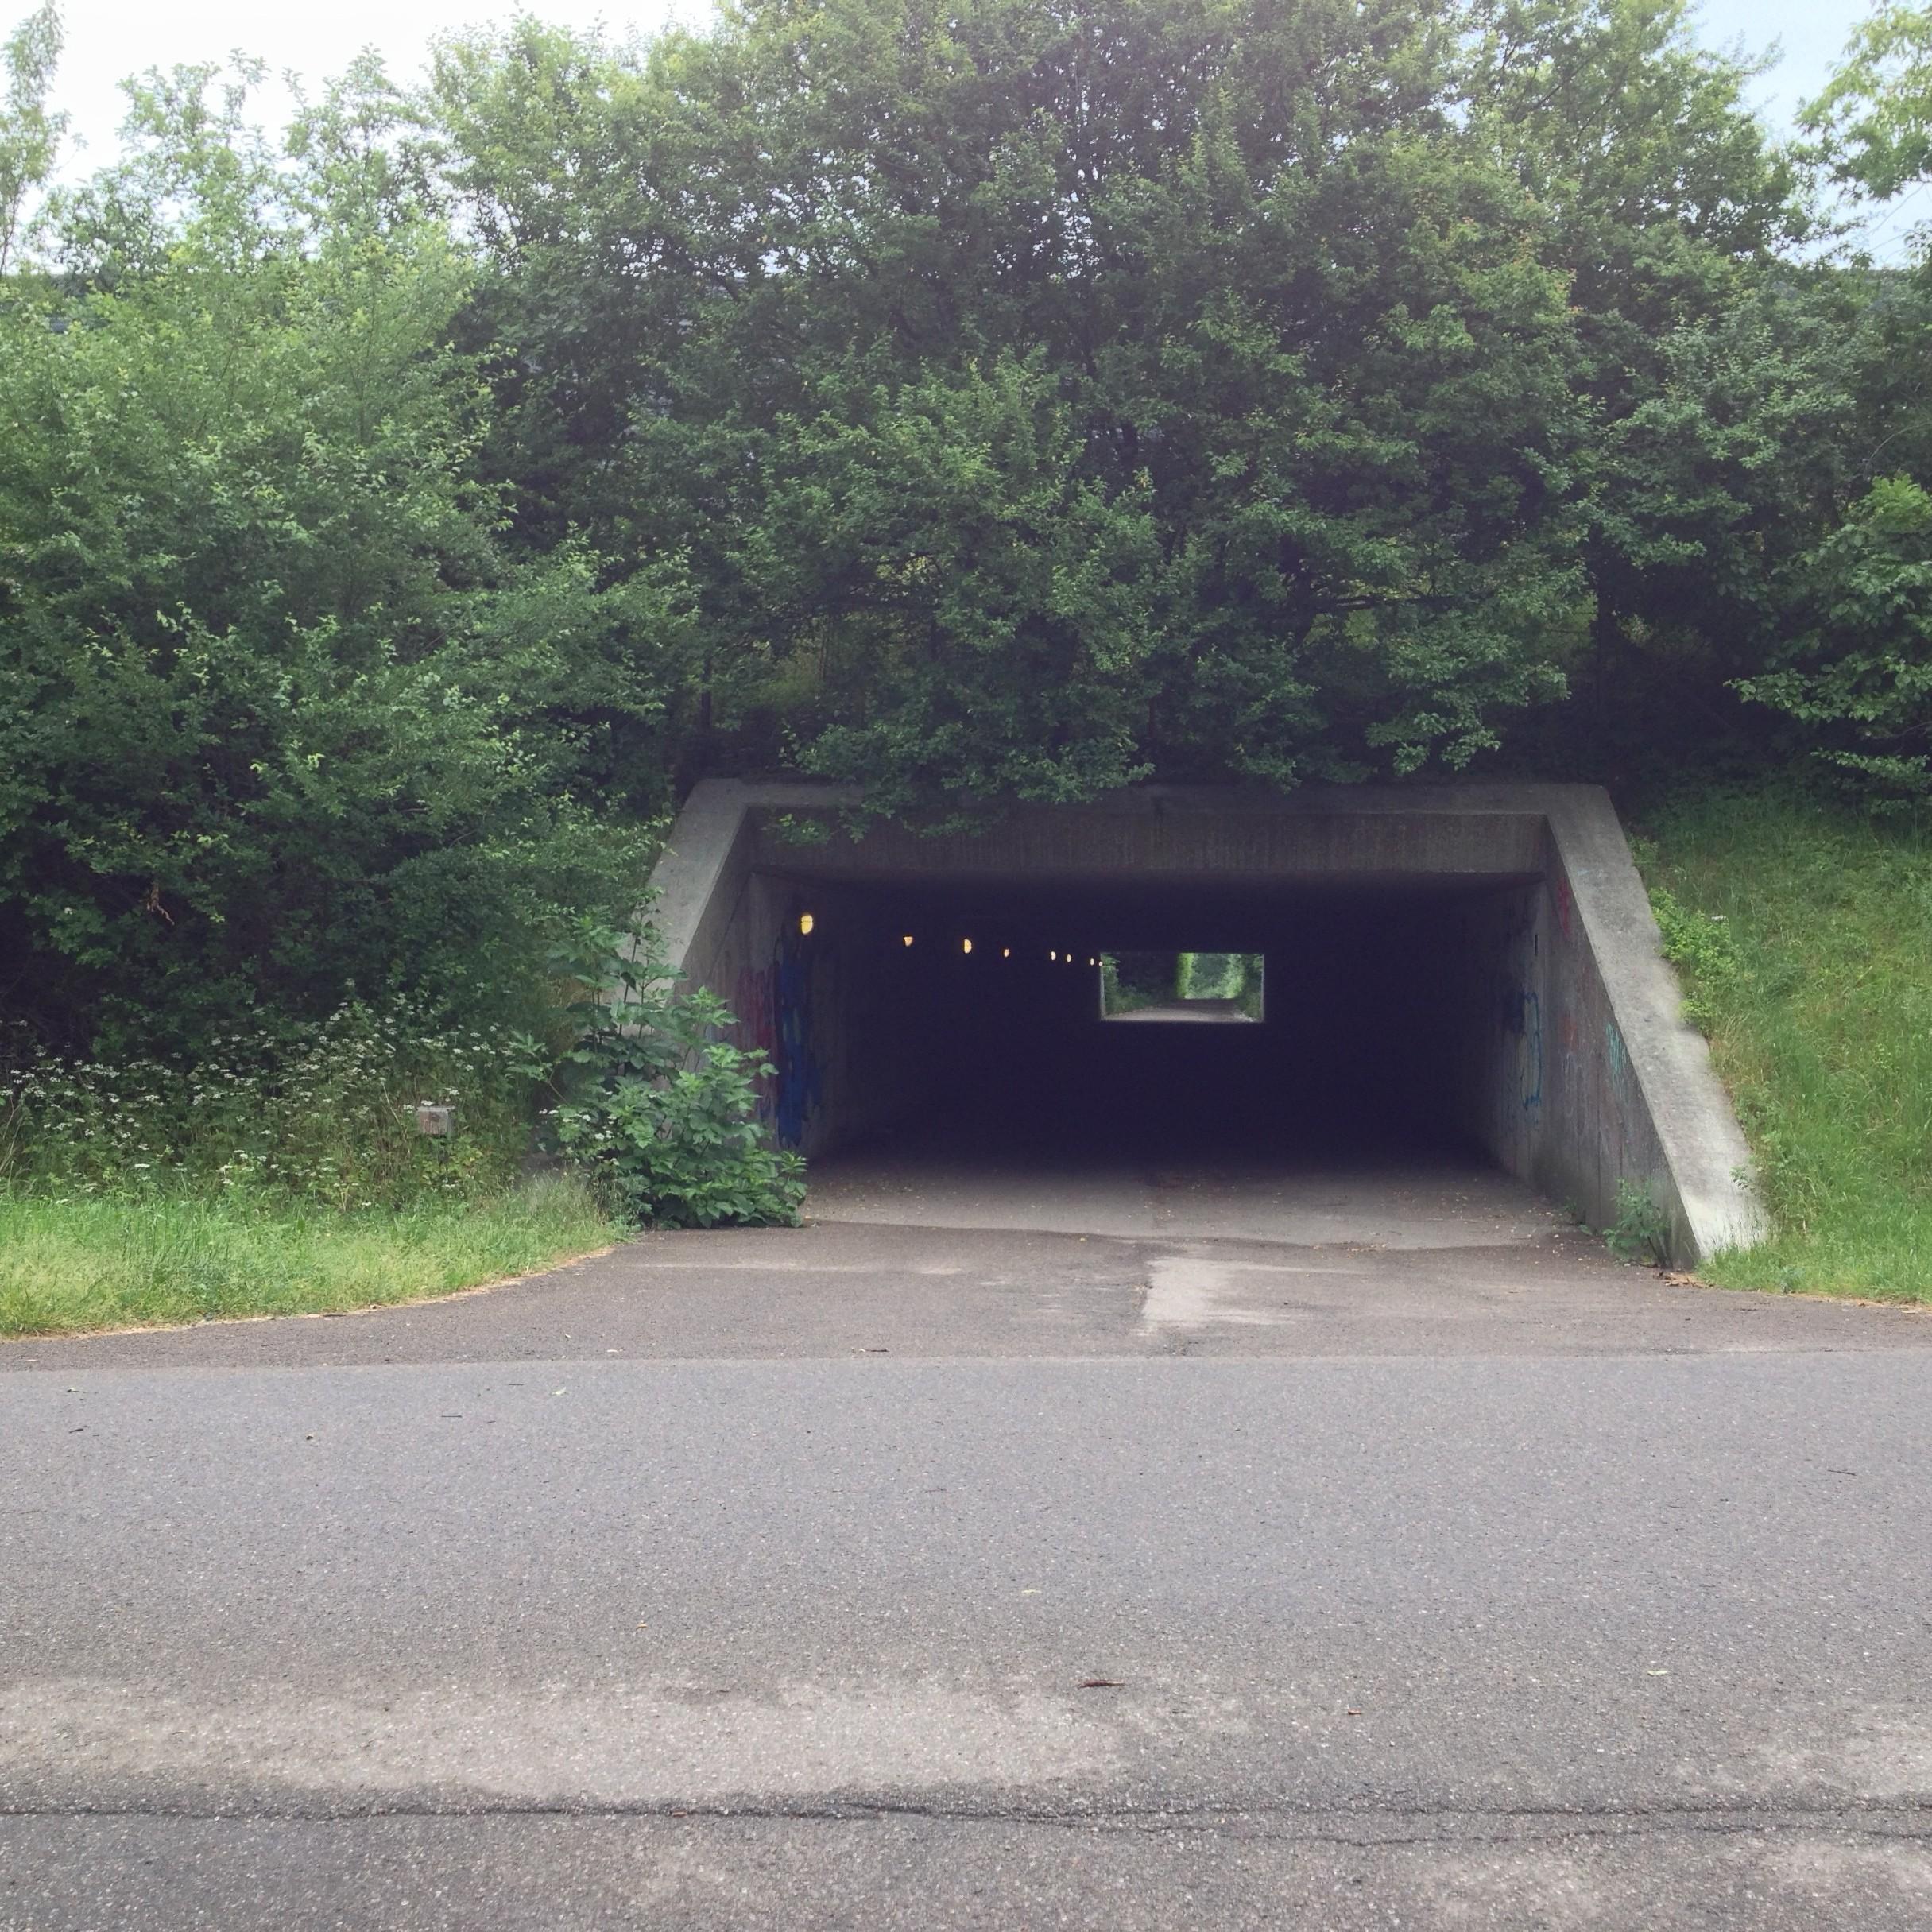 Segment 1.1, tunnellen set fra vest mod øst.